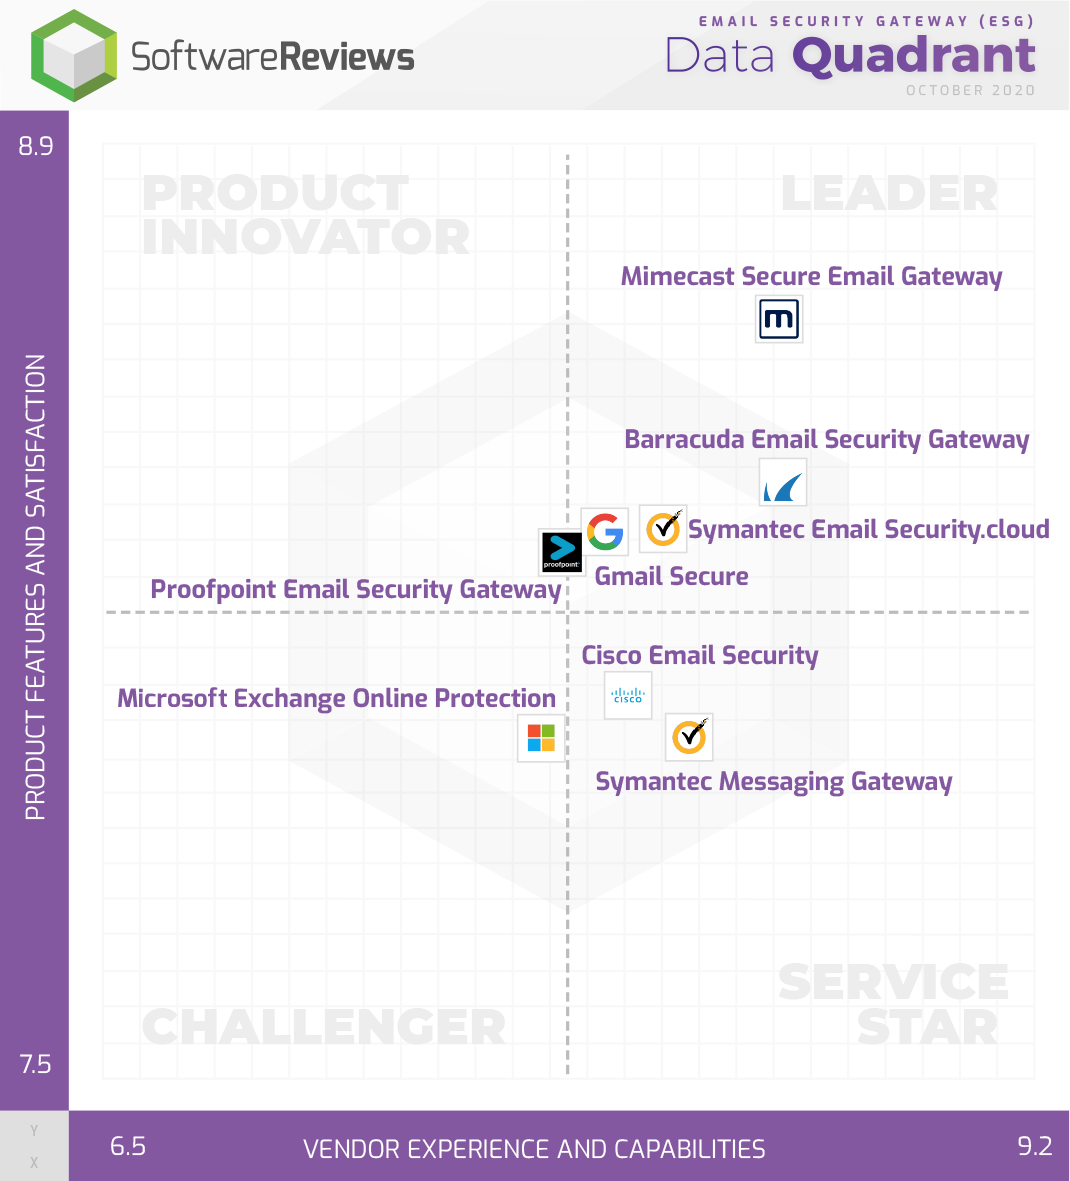 Email Security Gateway (ESG) Data Quadrant